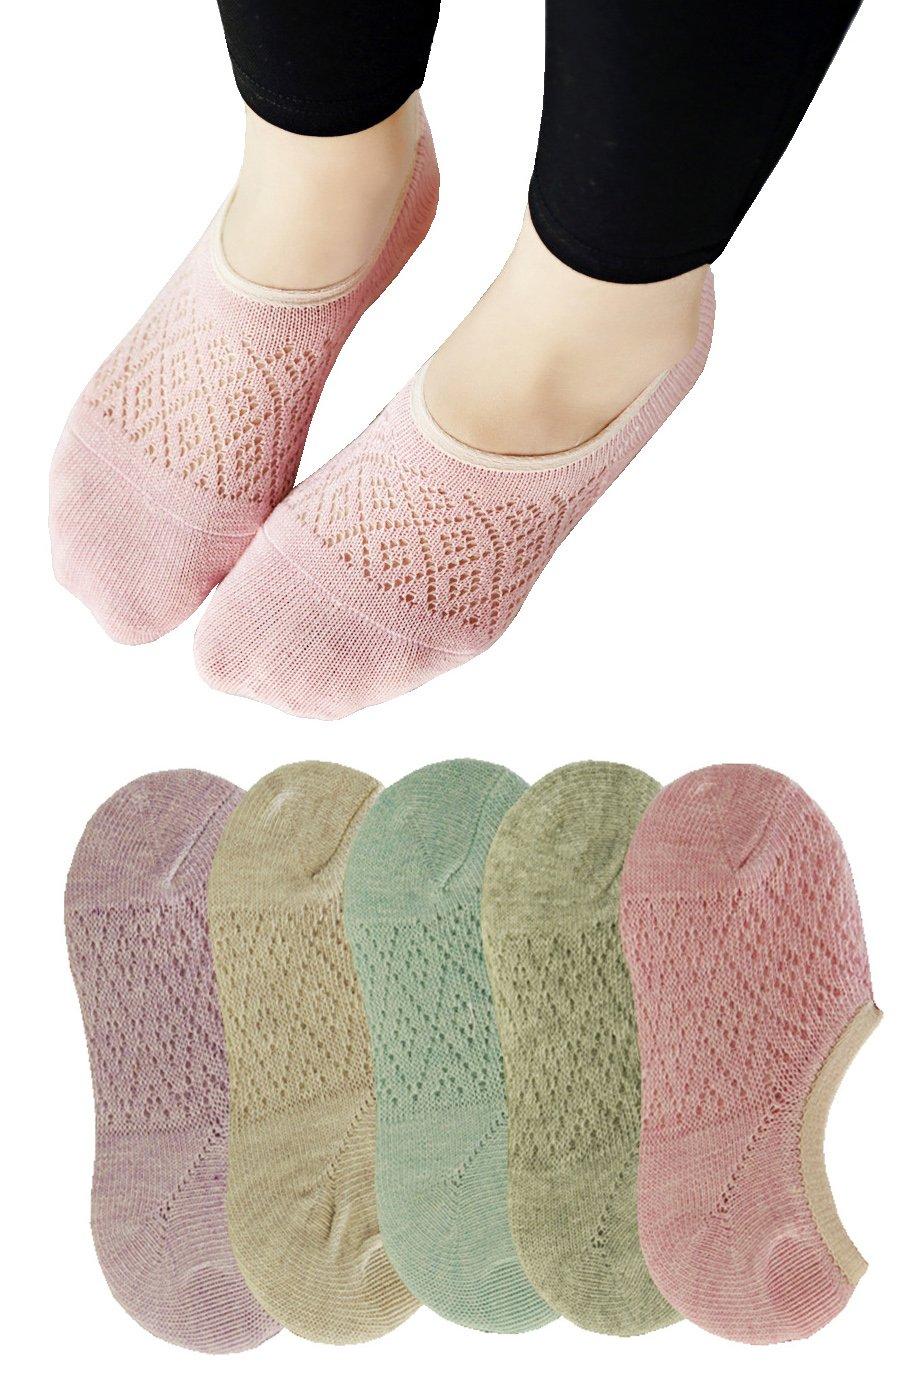 Searchself Women's Fashion Parent Mesh Thin No Show Fun Boat Liner Socks 5 Pack